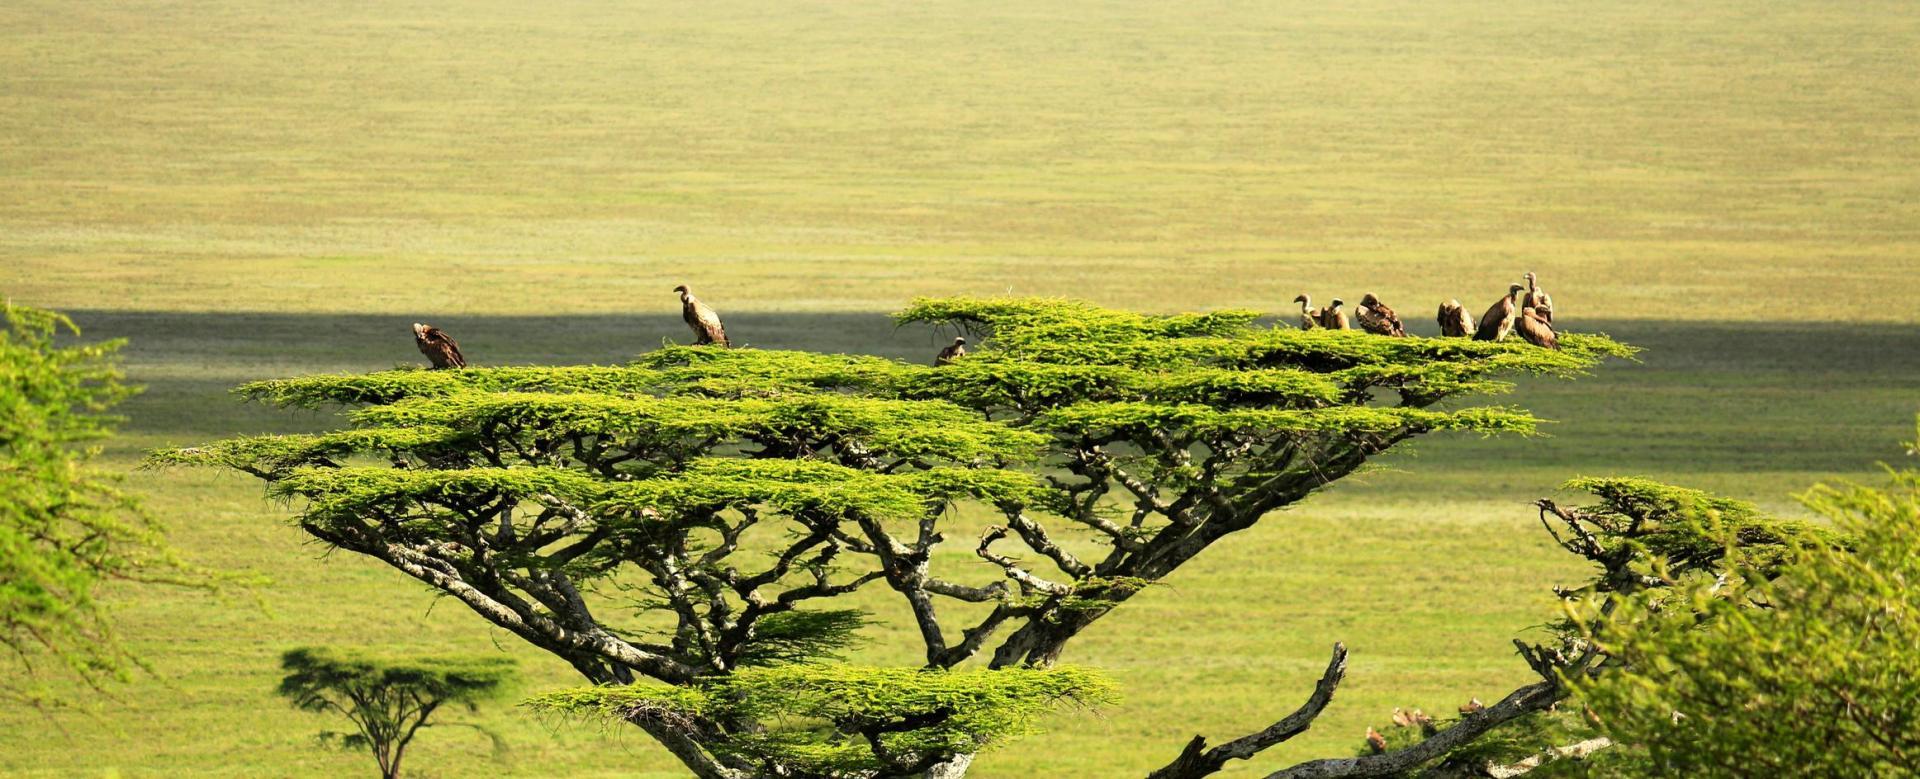 Voyage avec des animaux Tanzanie : Au coeur de la savane tanzanienne